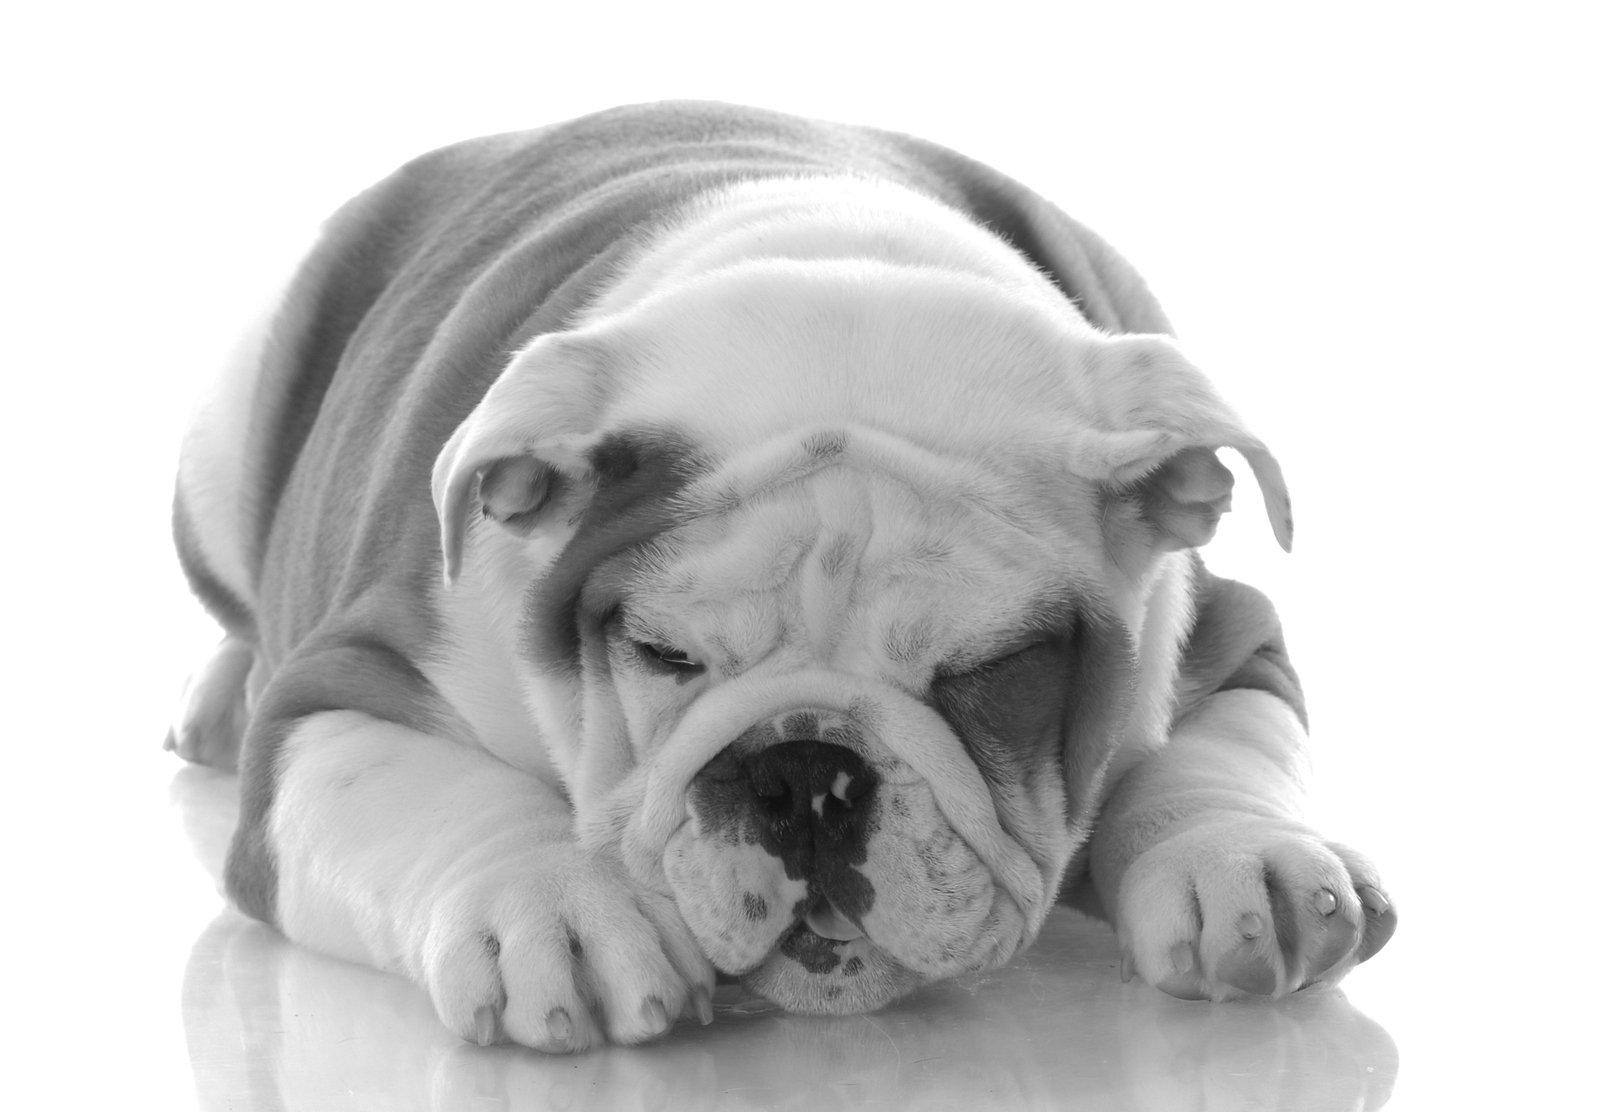 a bulldog puppy